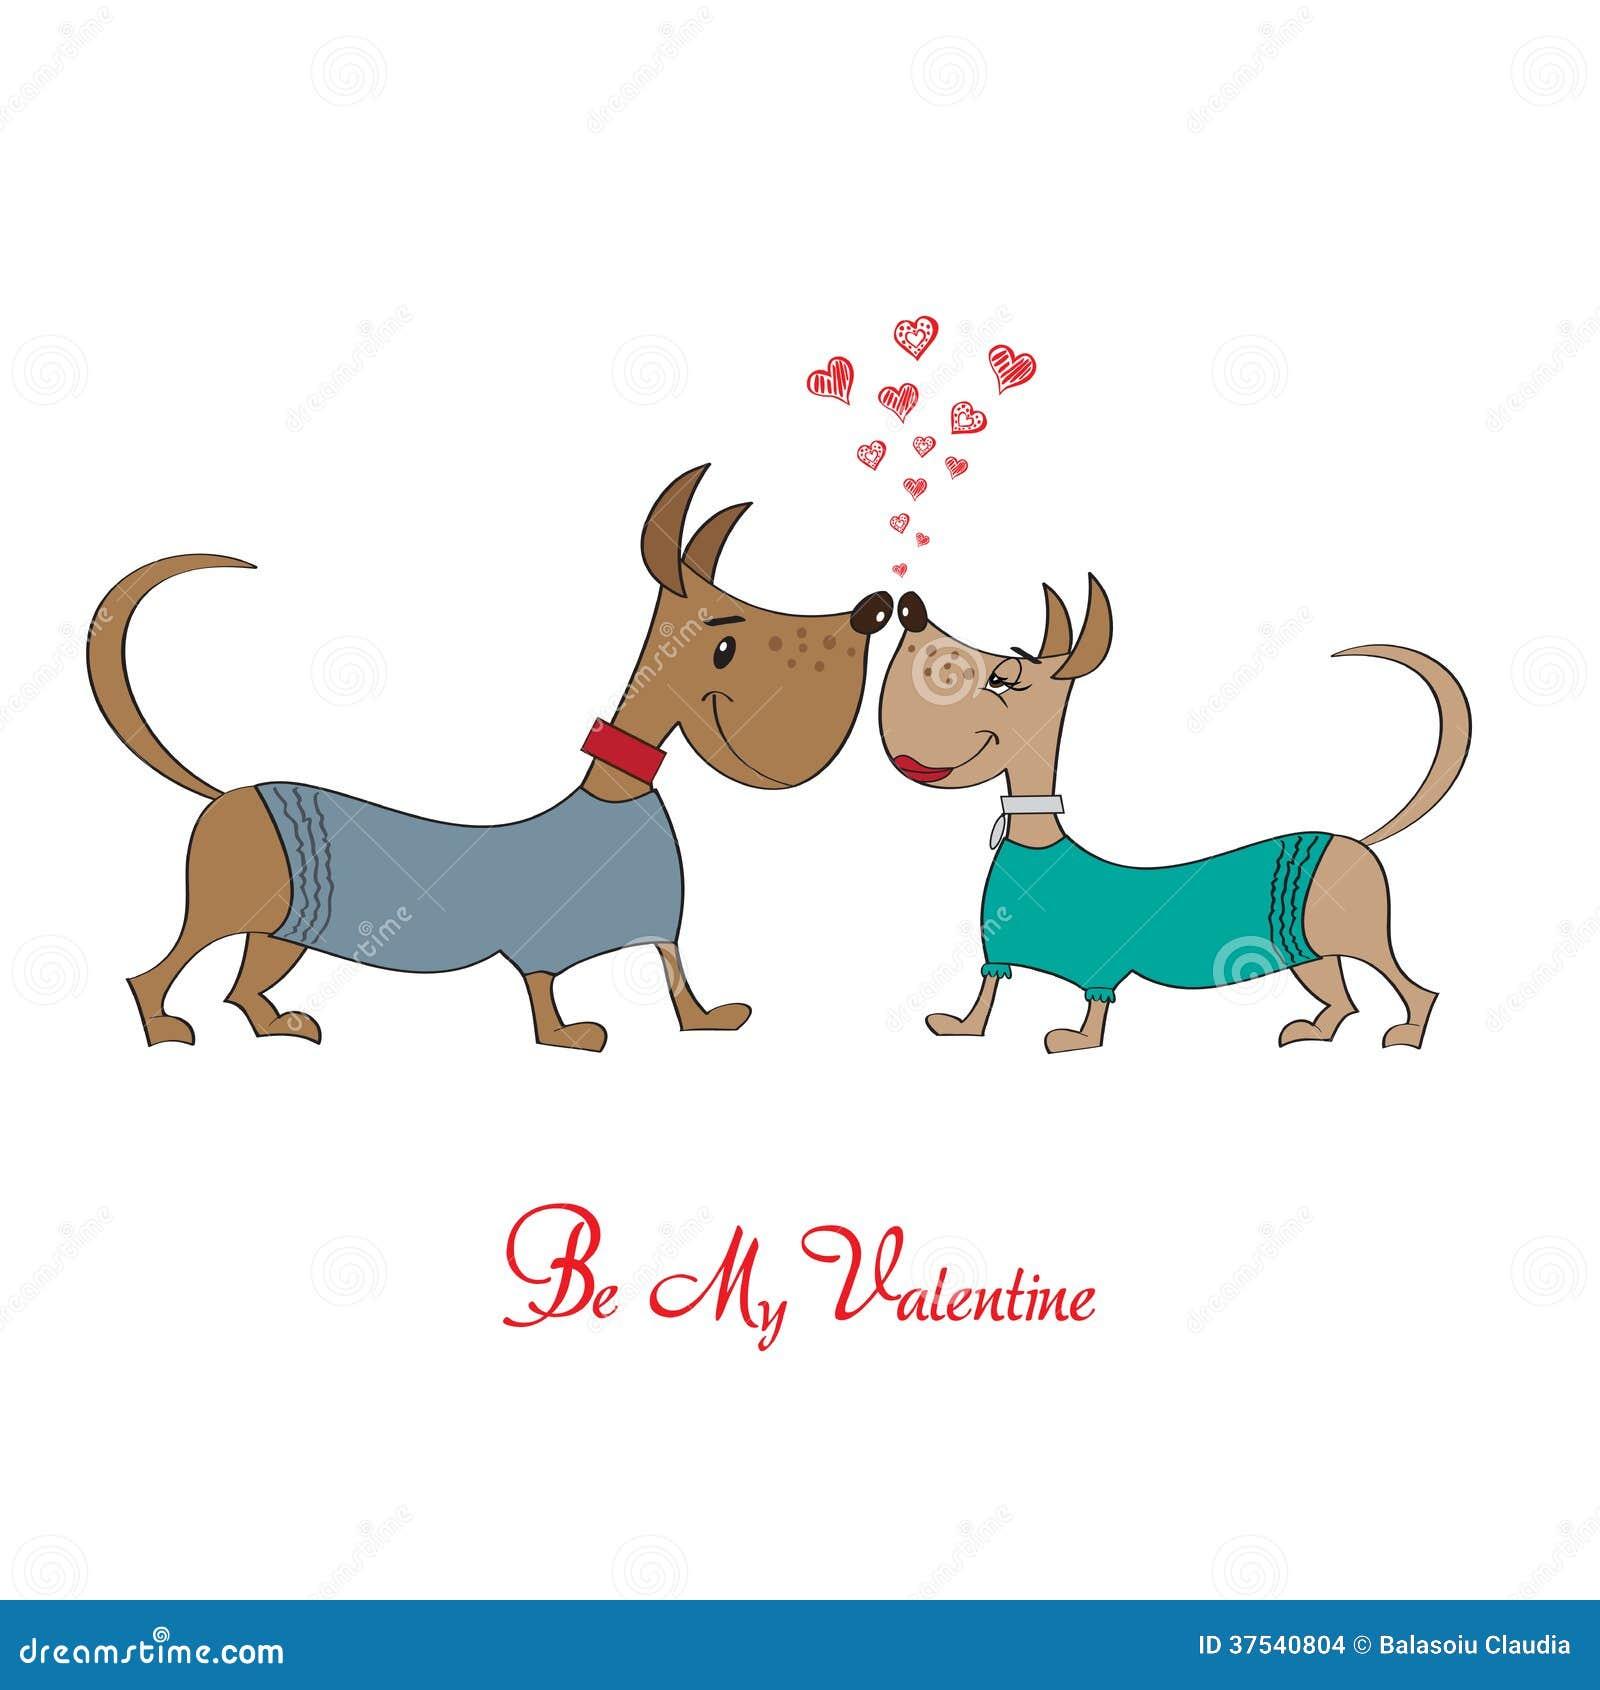 Valentine s day greeting card with cartoon dog characters stock valentine s day greeting card with cartoon dog characters kristyandbryce Gallery